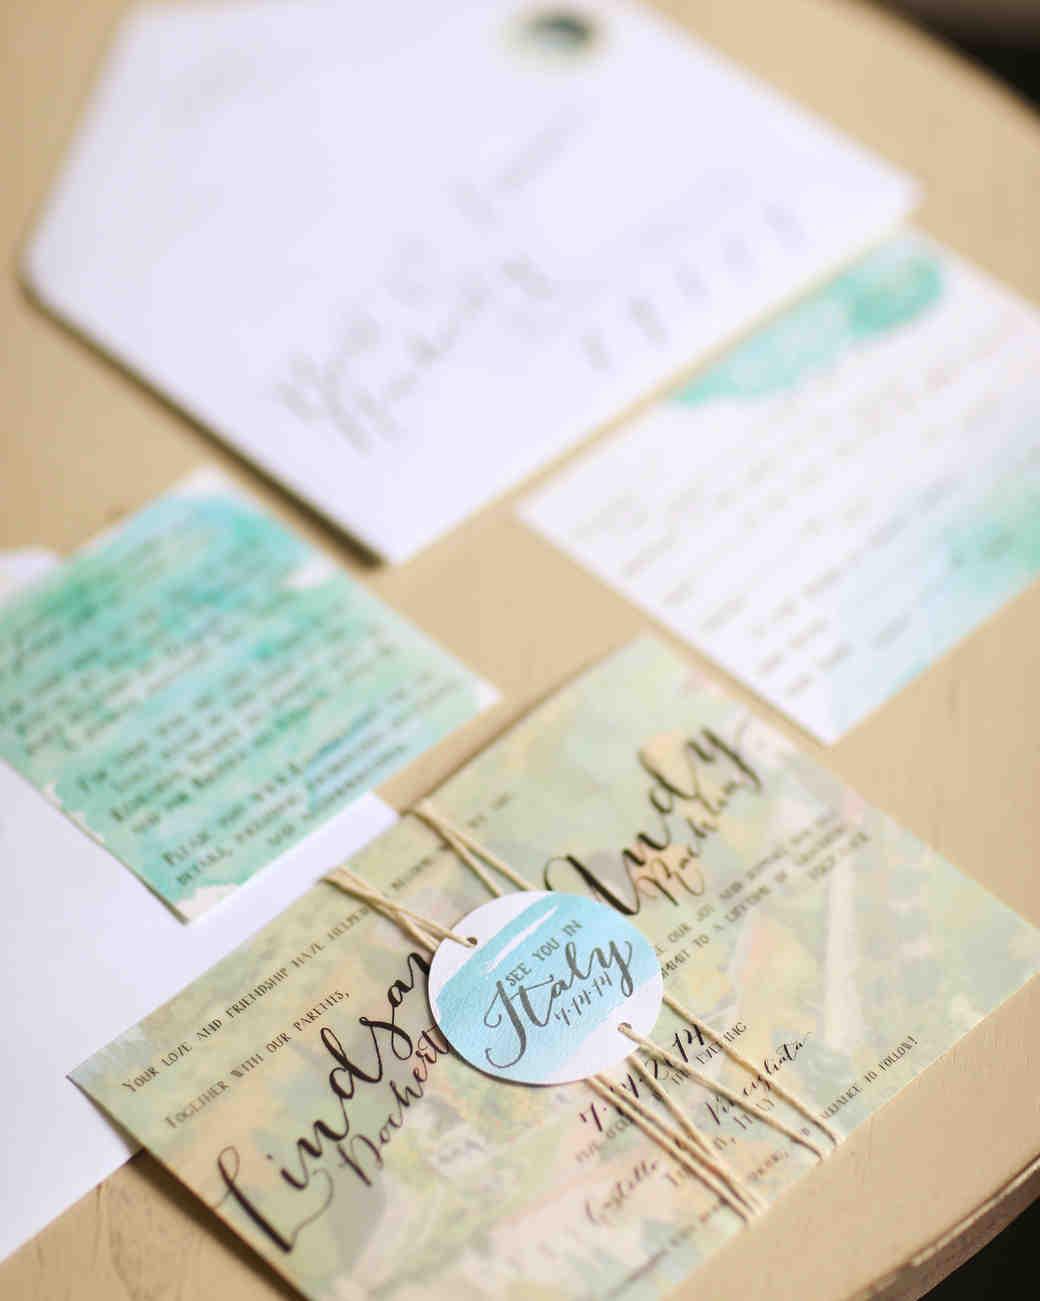 lindsay-andy-wedding-invite-0077-s111659-1114.jpg